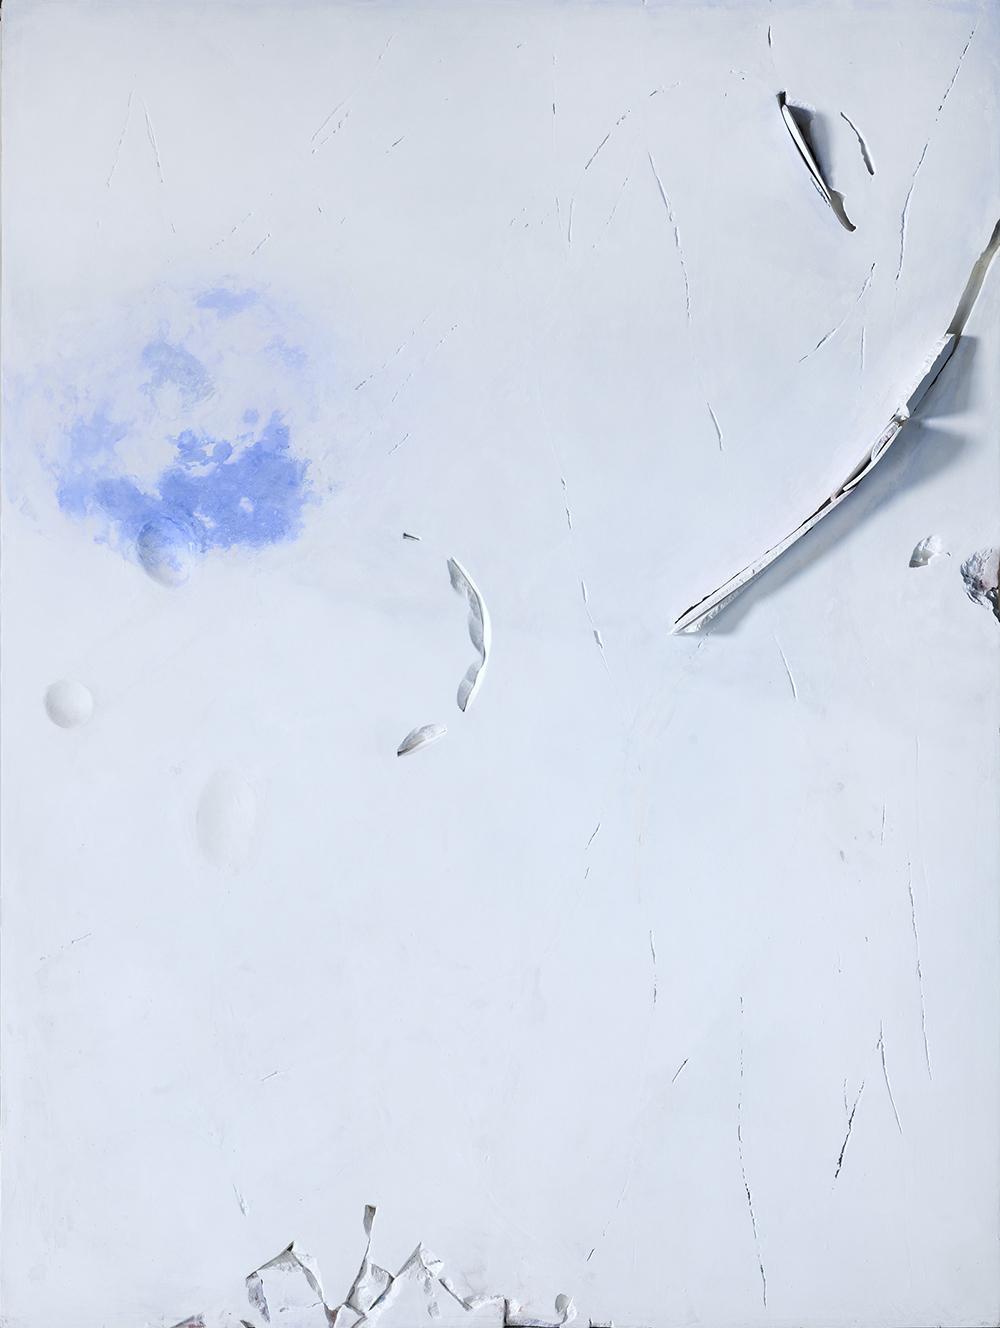 Impossibili restauri, 2009, tecnica mista su tavola, cm 200x150